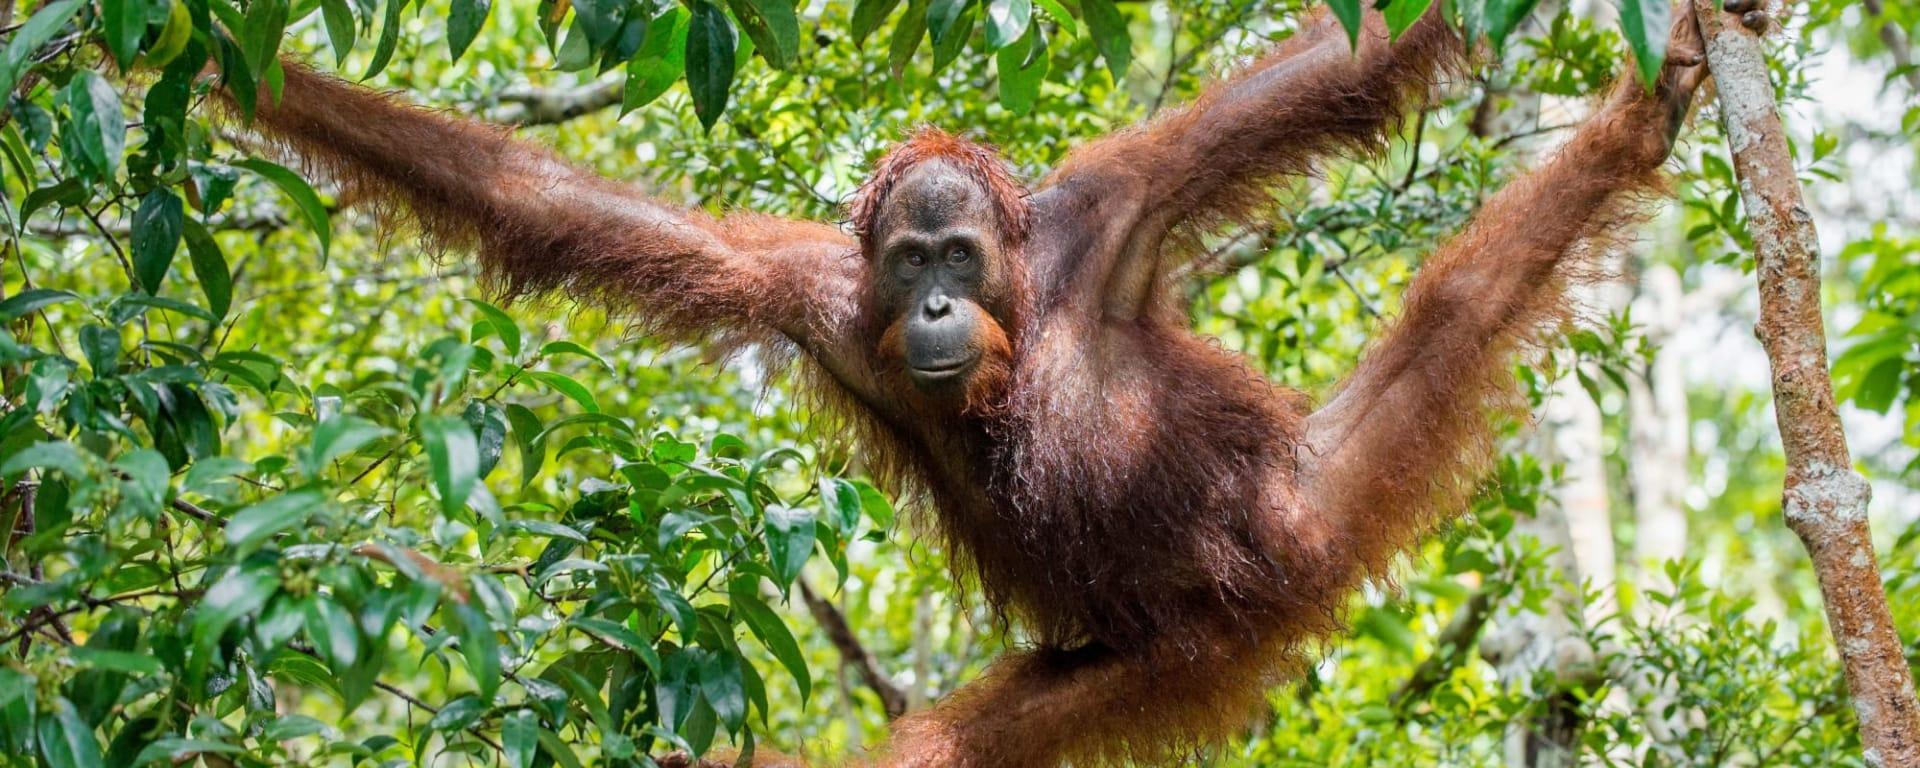 Höhepunkte Borneos ab Kuching: Borneo Orang Utan